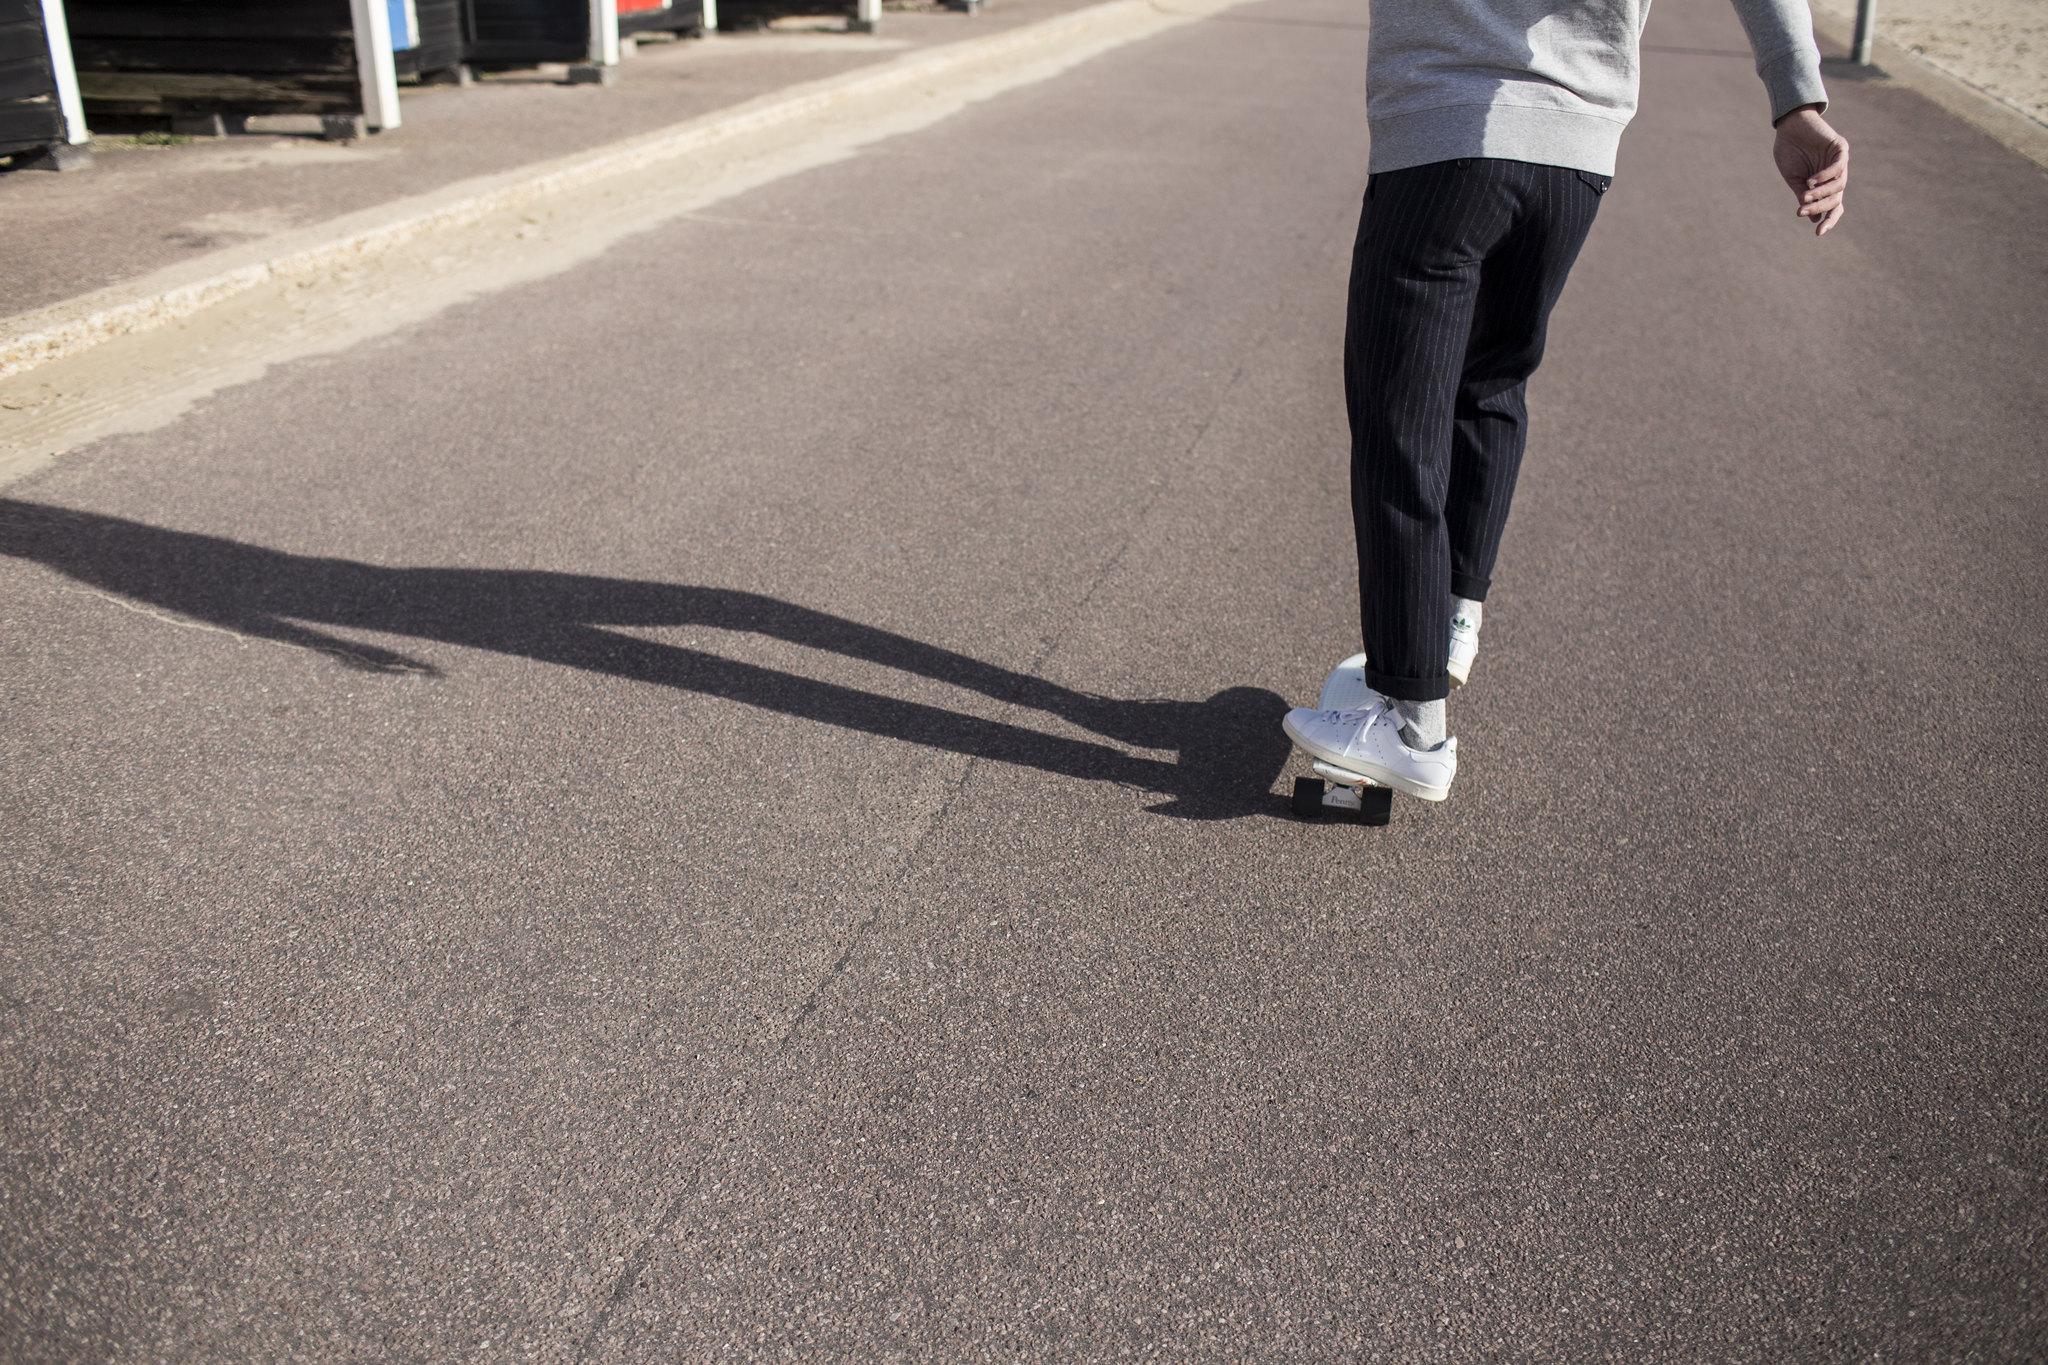 Jordan_Bunker_penny_skateboards_12